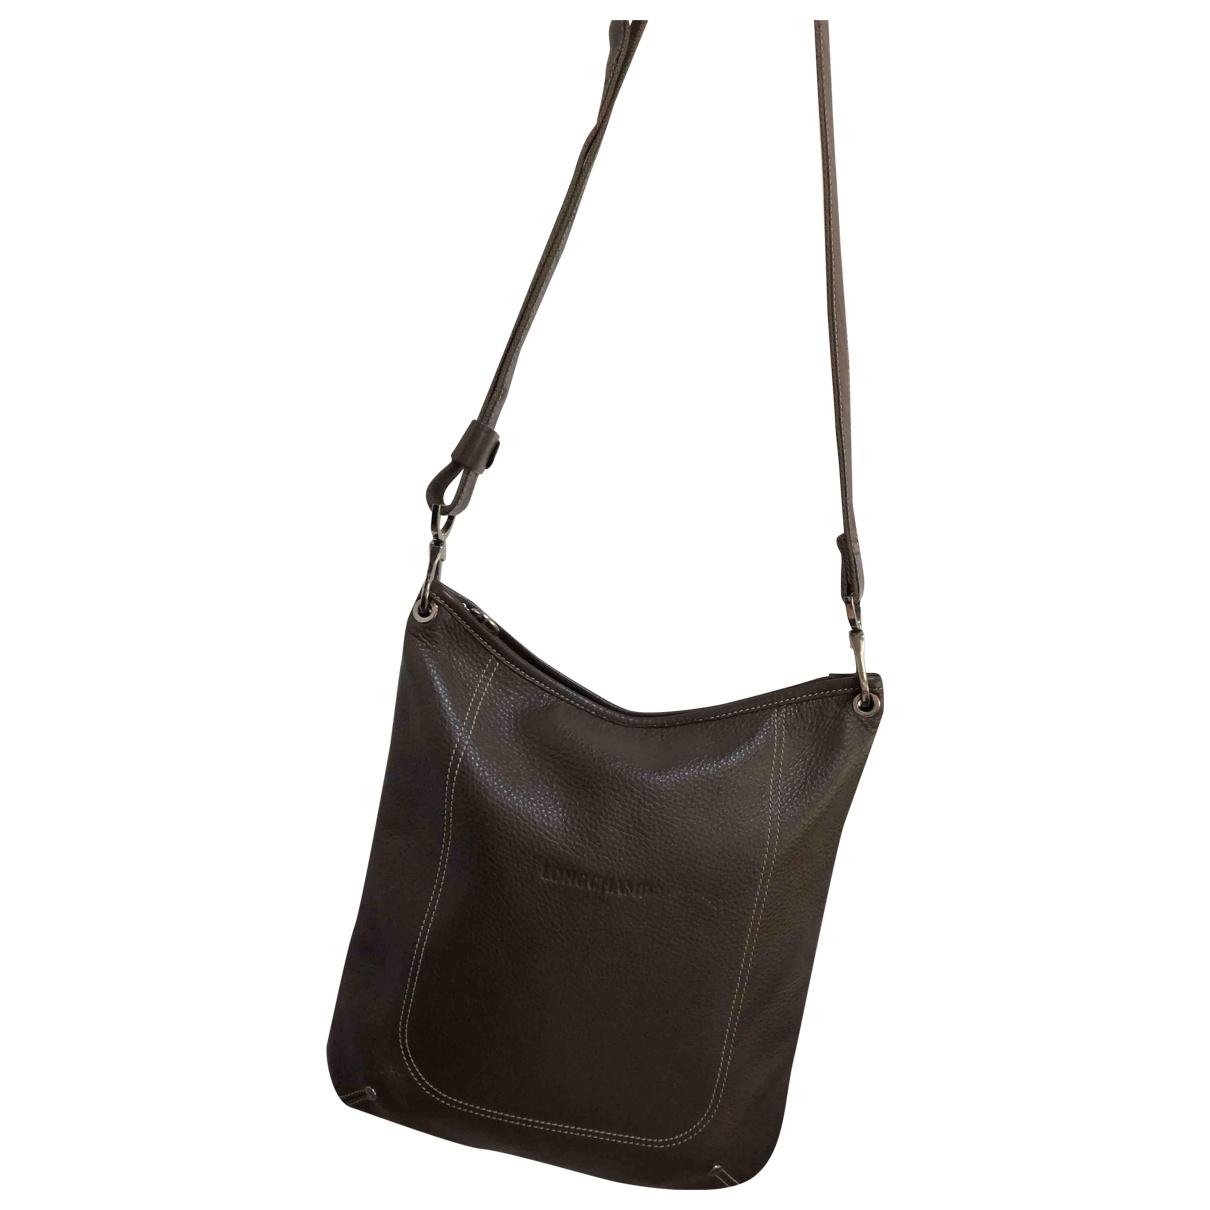 Longchamp N Brown Leather Clutch bag for Women N